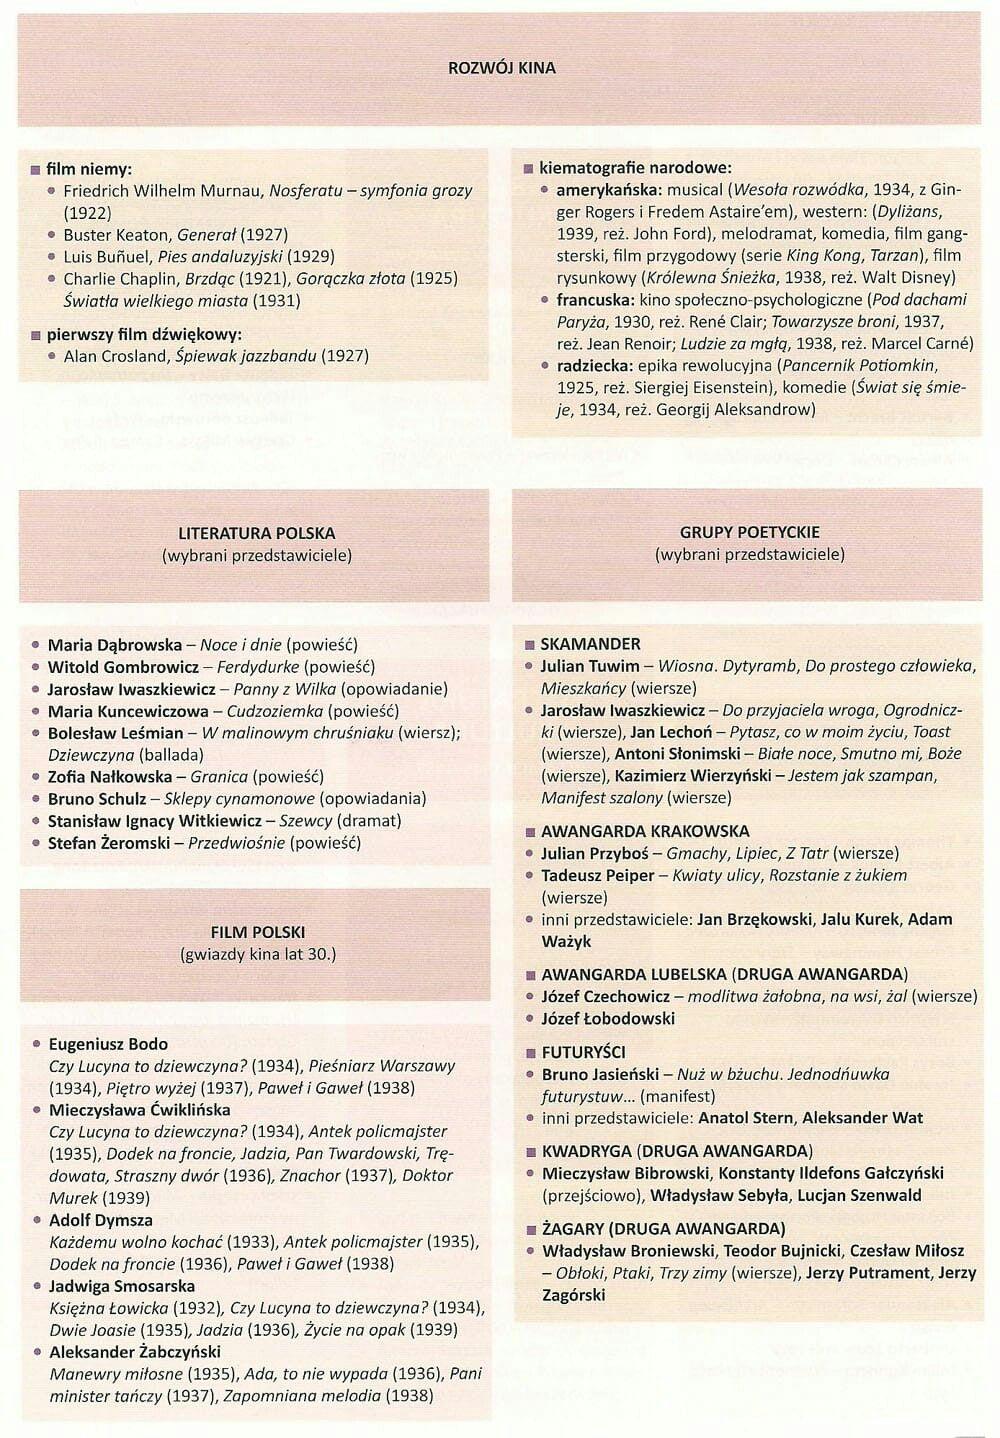 Pin By Kasia Brylka On Język School Notes Education Studyblr